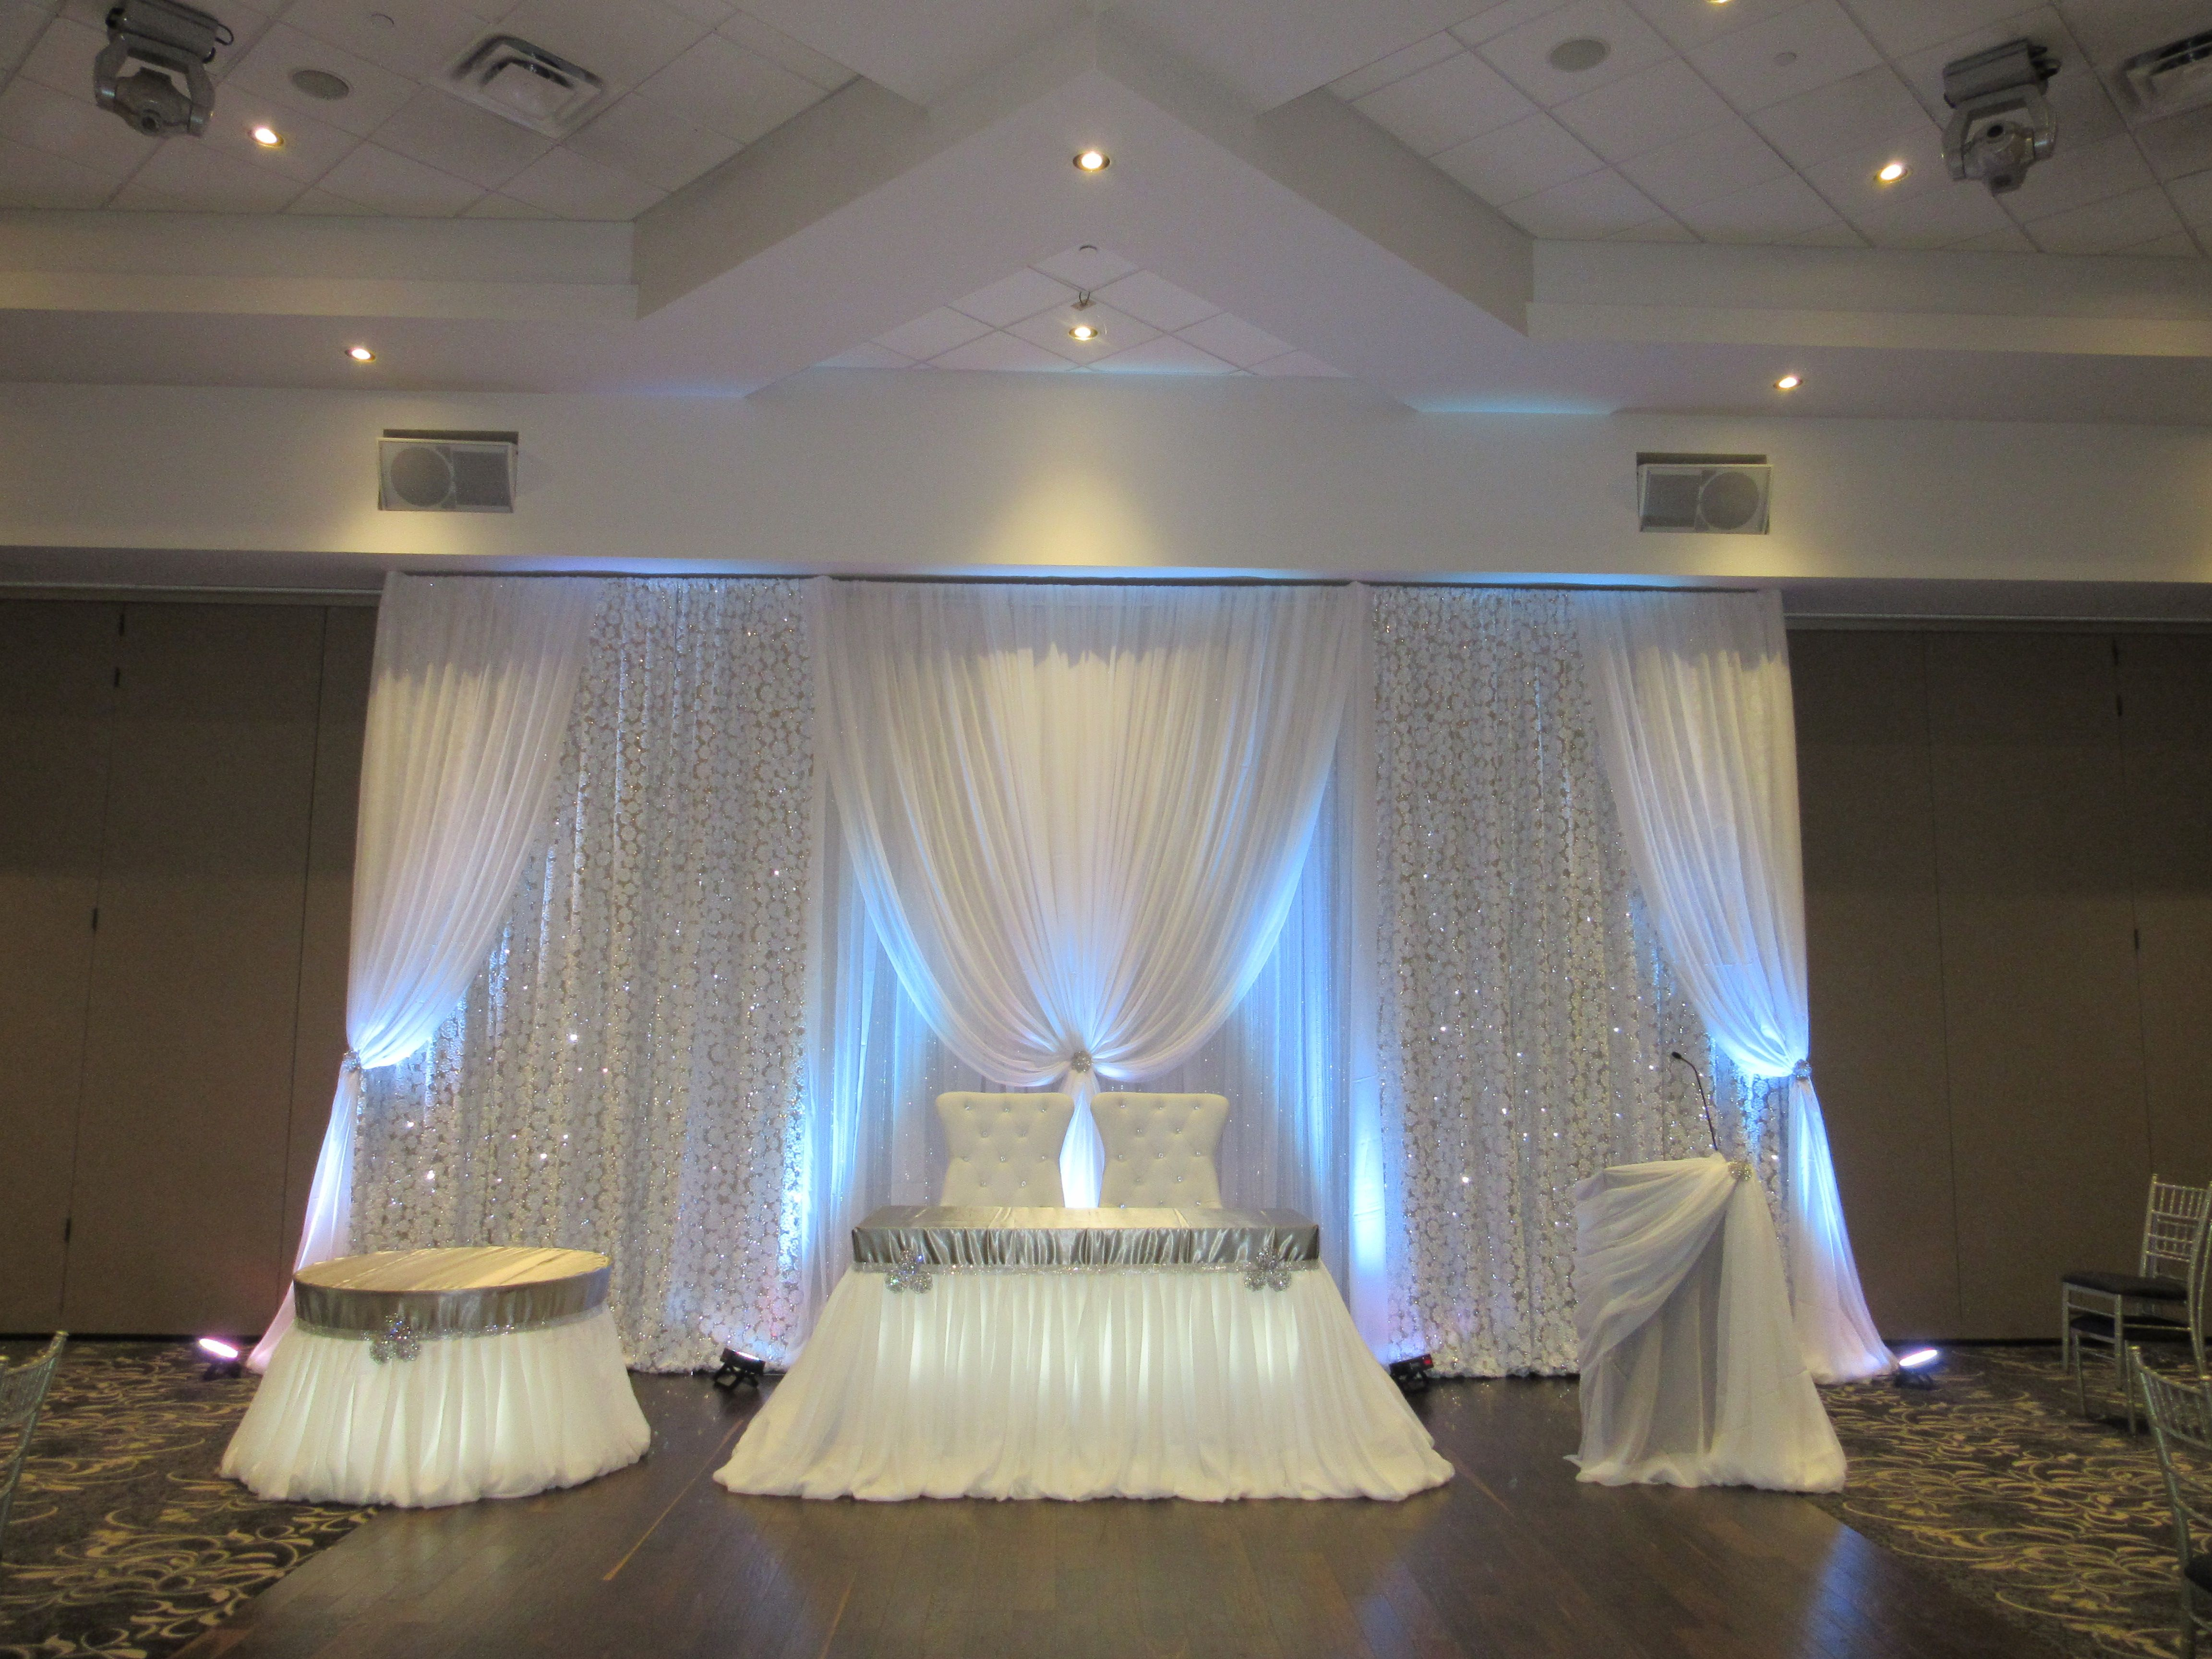 Wedding Backdrops By Mega City Group #Wedding #Decor #Backdrop